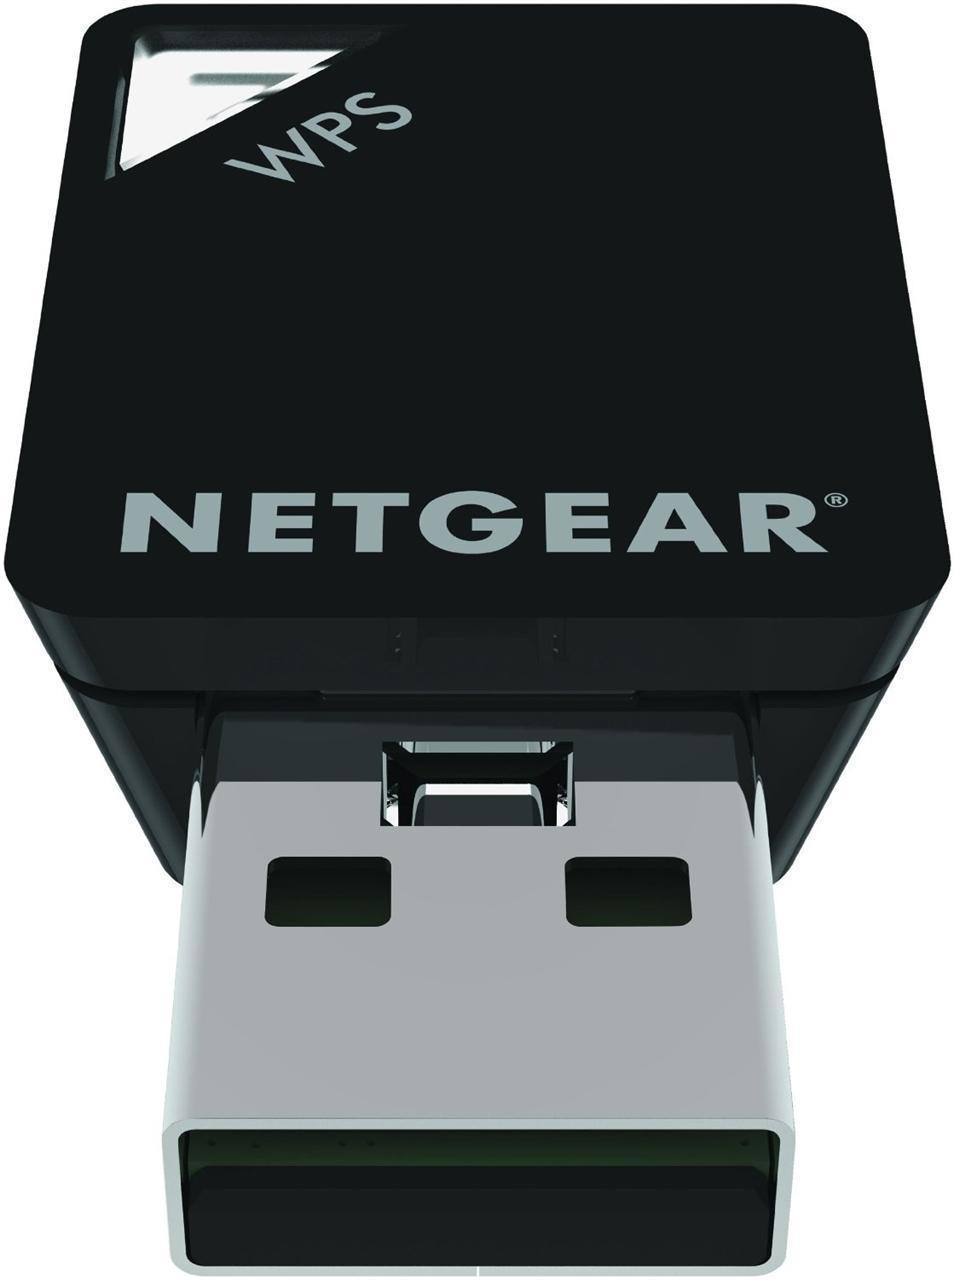 netgear a6100 600mbps wireless ac usb adapter novatech. Black Bedroom Furniture Sets. Home Design Ideas